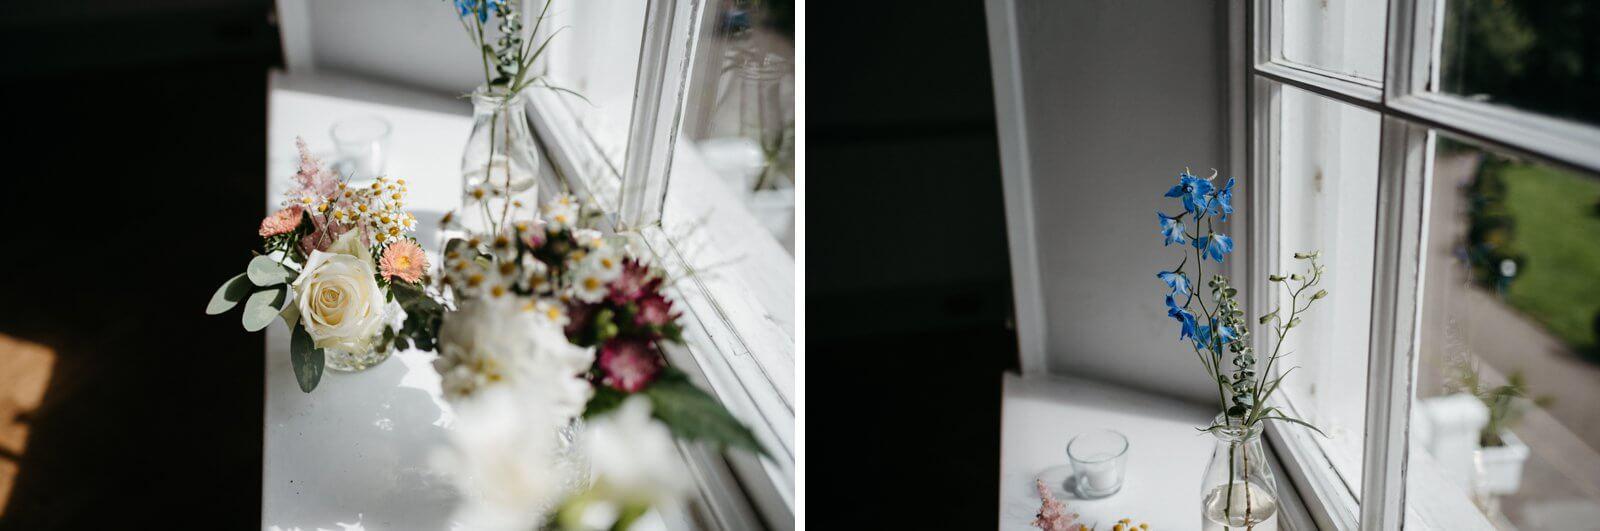 Beautiful handpicked wildflower arrangements on window ledge at Belair House